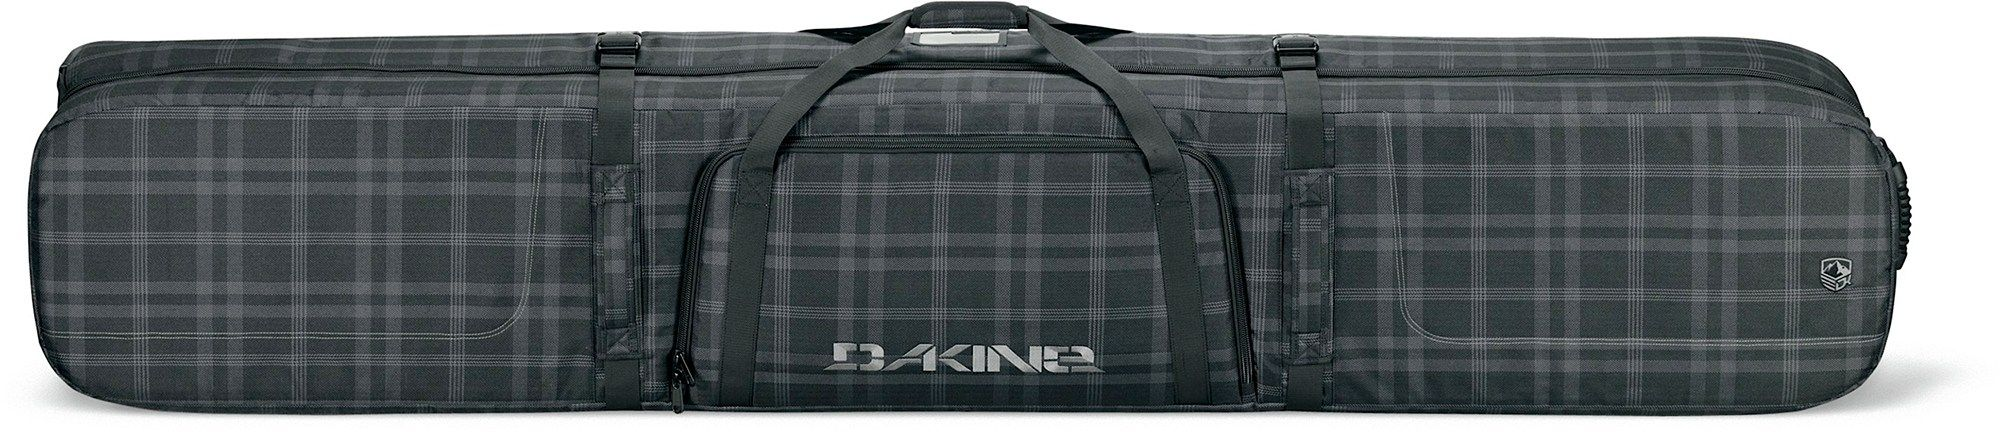 Dakine Concourse Double Ski Bag 225